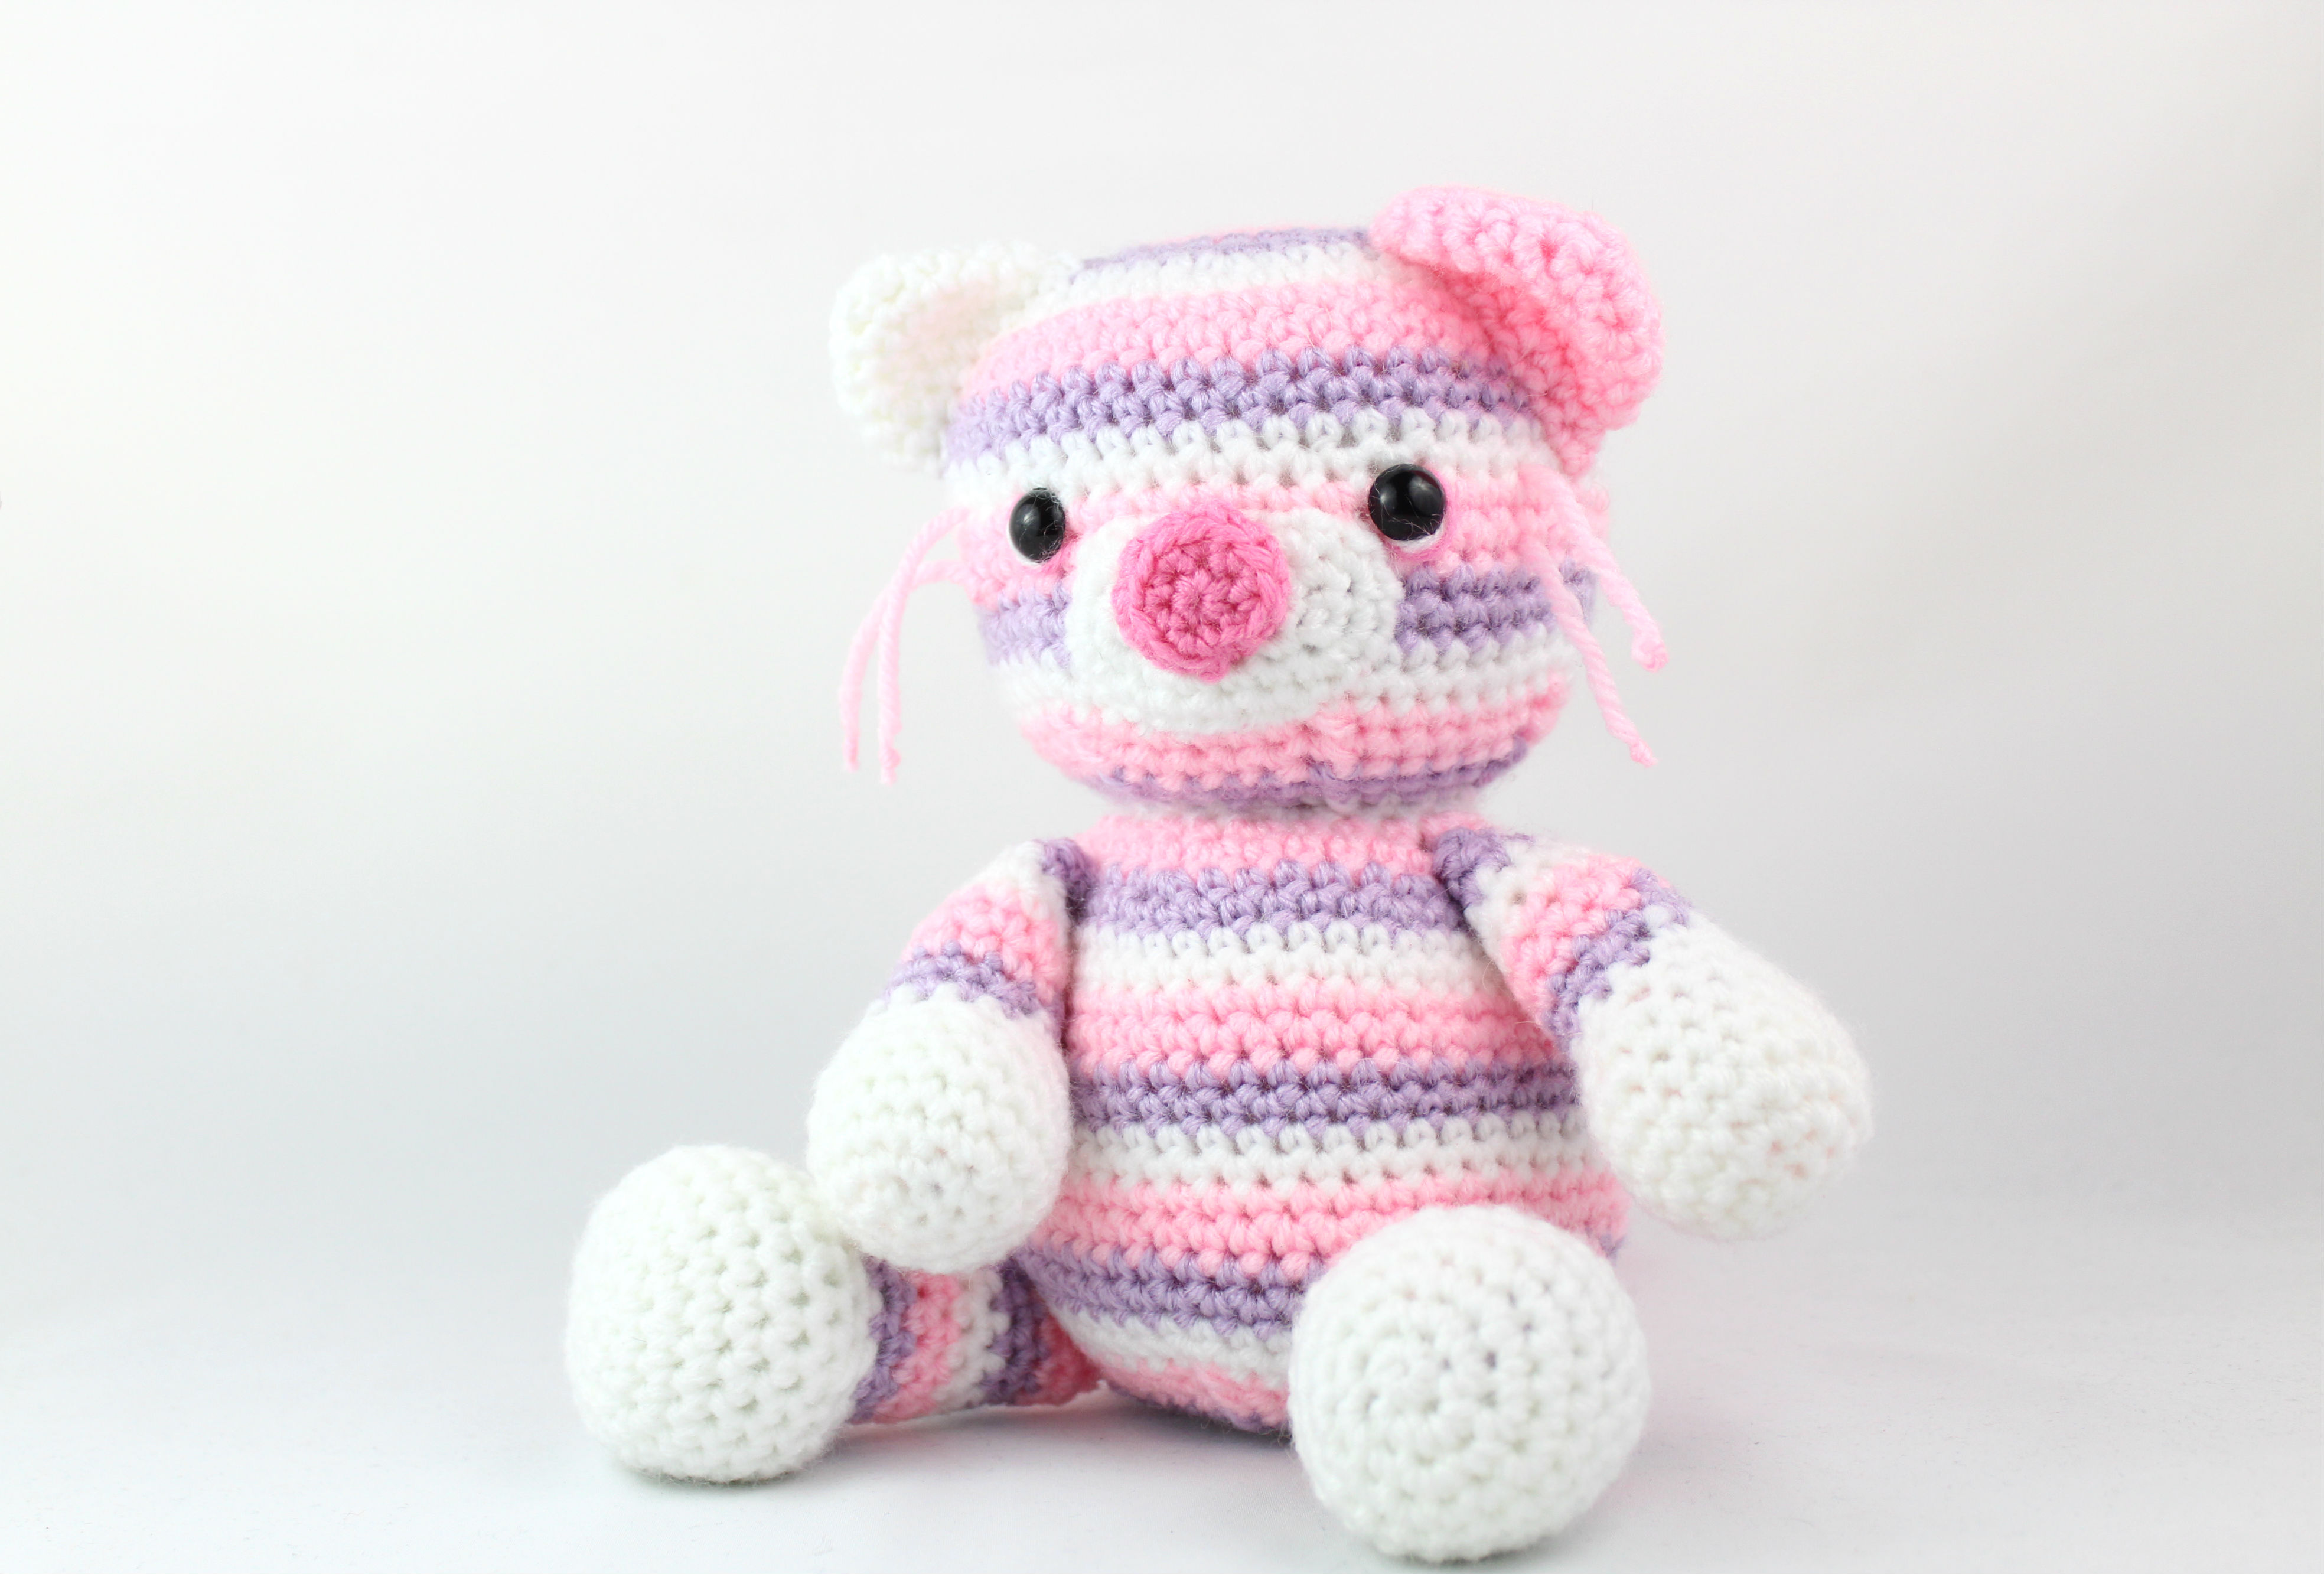 Large plush cat amigurumi pattern | Amiguroom Toys | 2665x3935